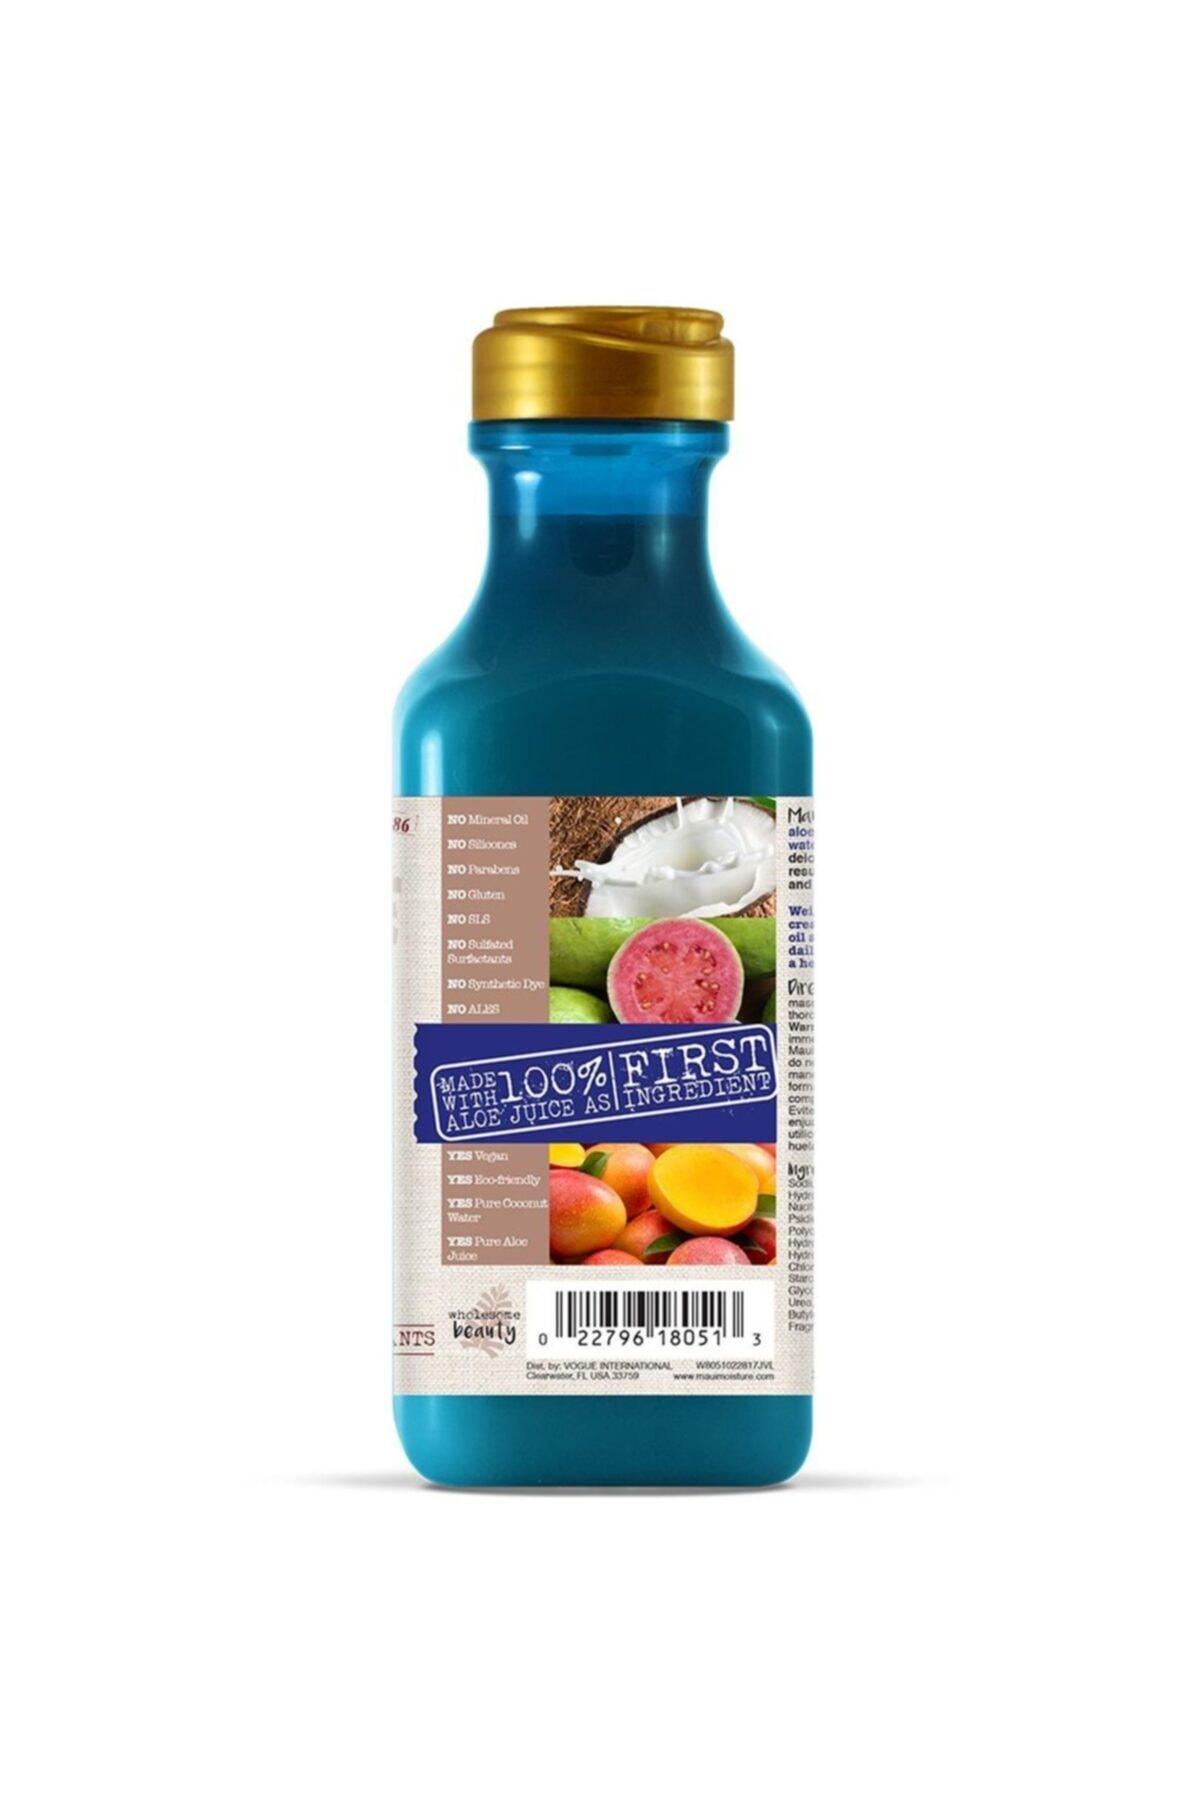 Maui Coconut Milk Şampuan 385ml